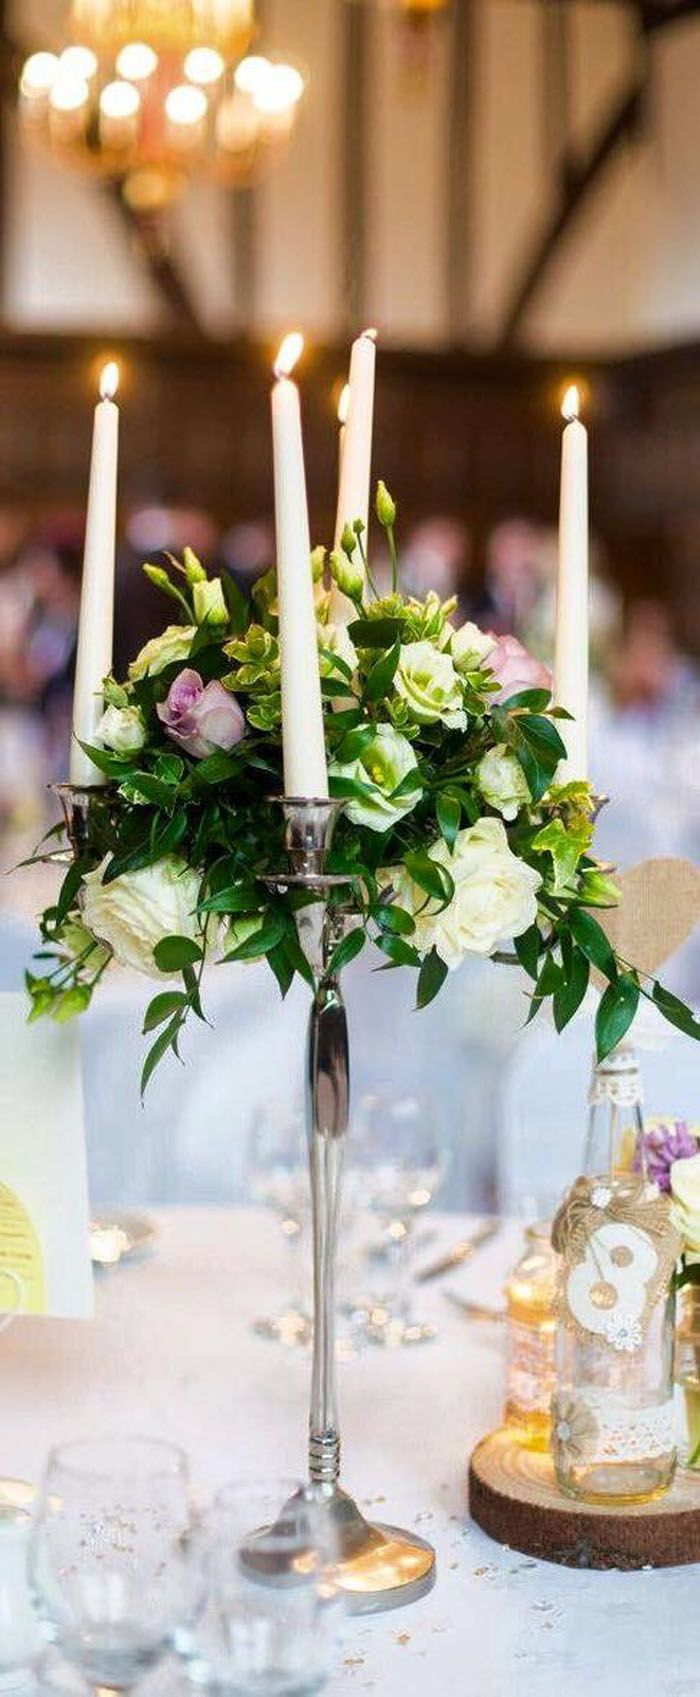 A colourful spring wedding in York: James & Cheryl Tanner | weddingsite.co.uk